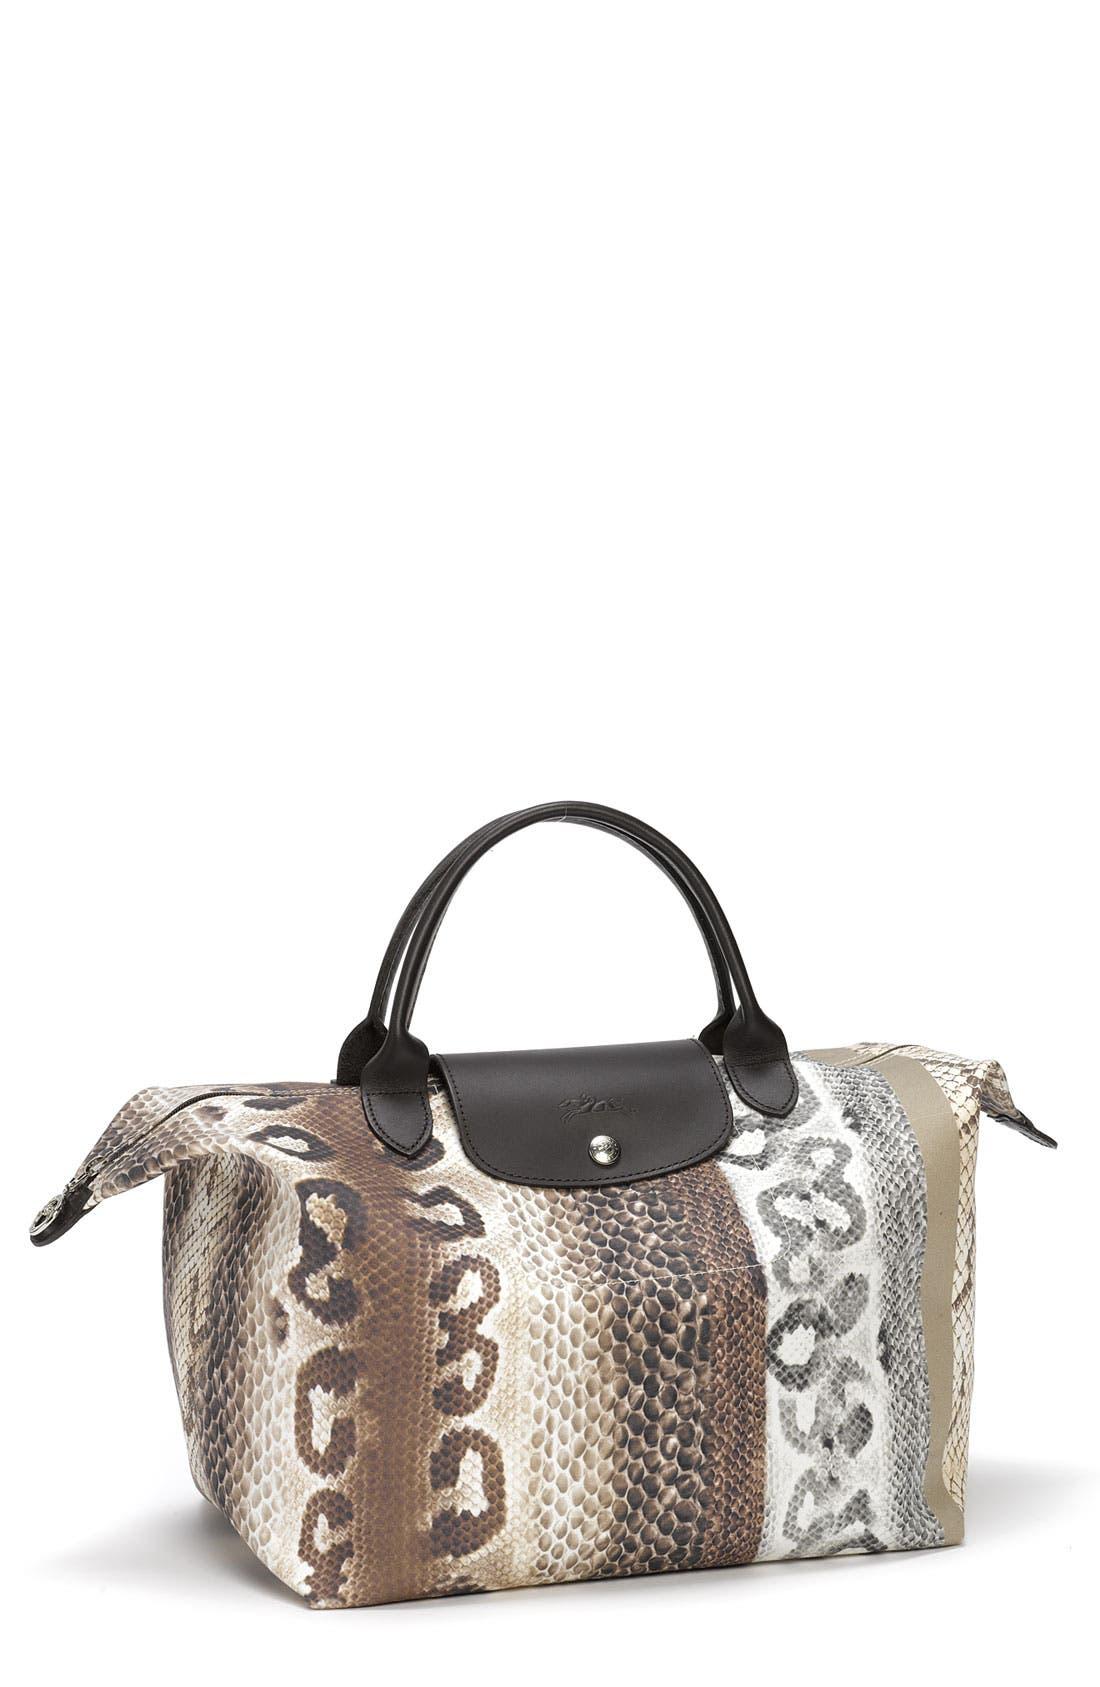 Main Image - Longchamp 'Reptiligne Toile' Handbag